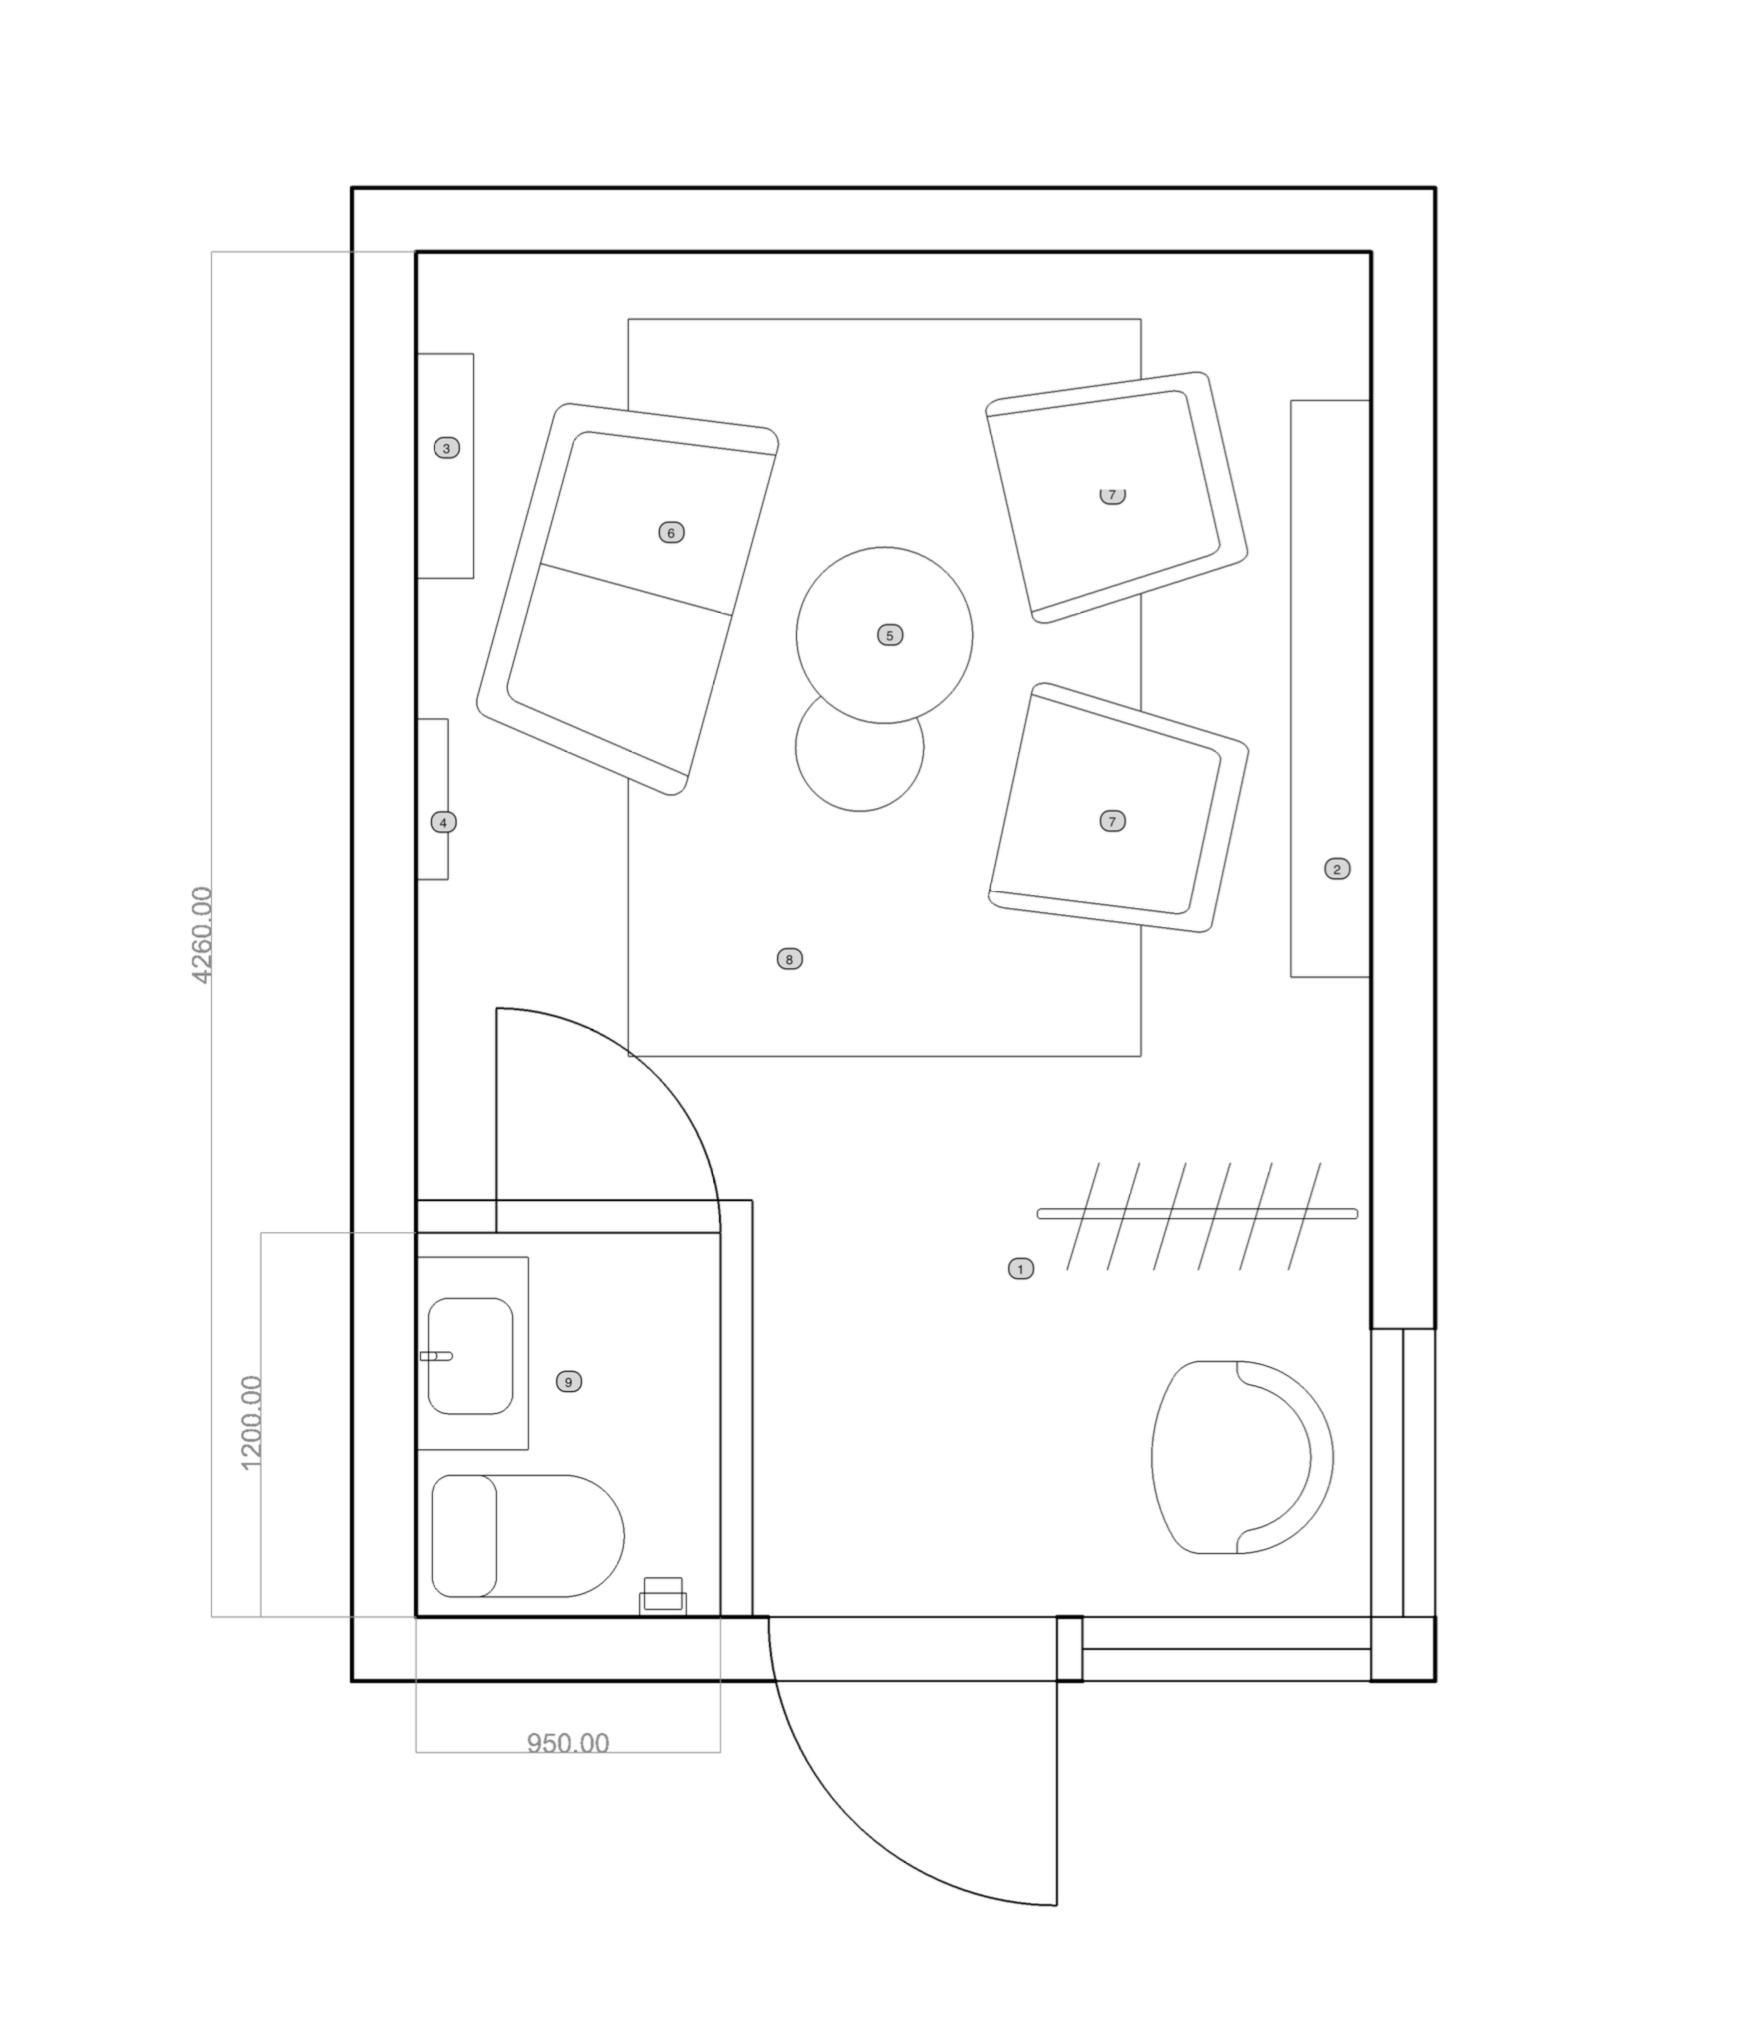 INTERIOR DESIGN PLAN FOR HOME OFFICE